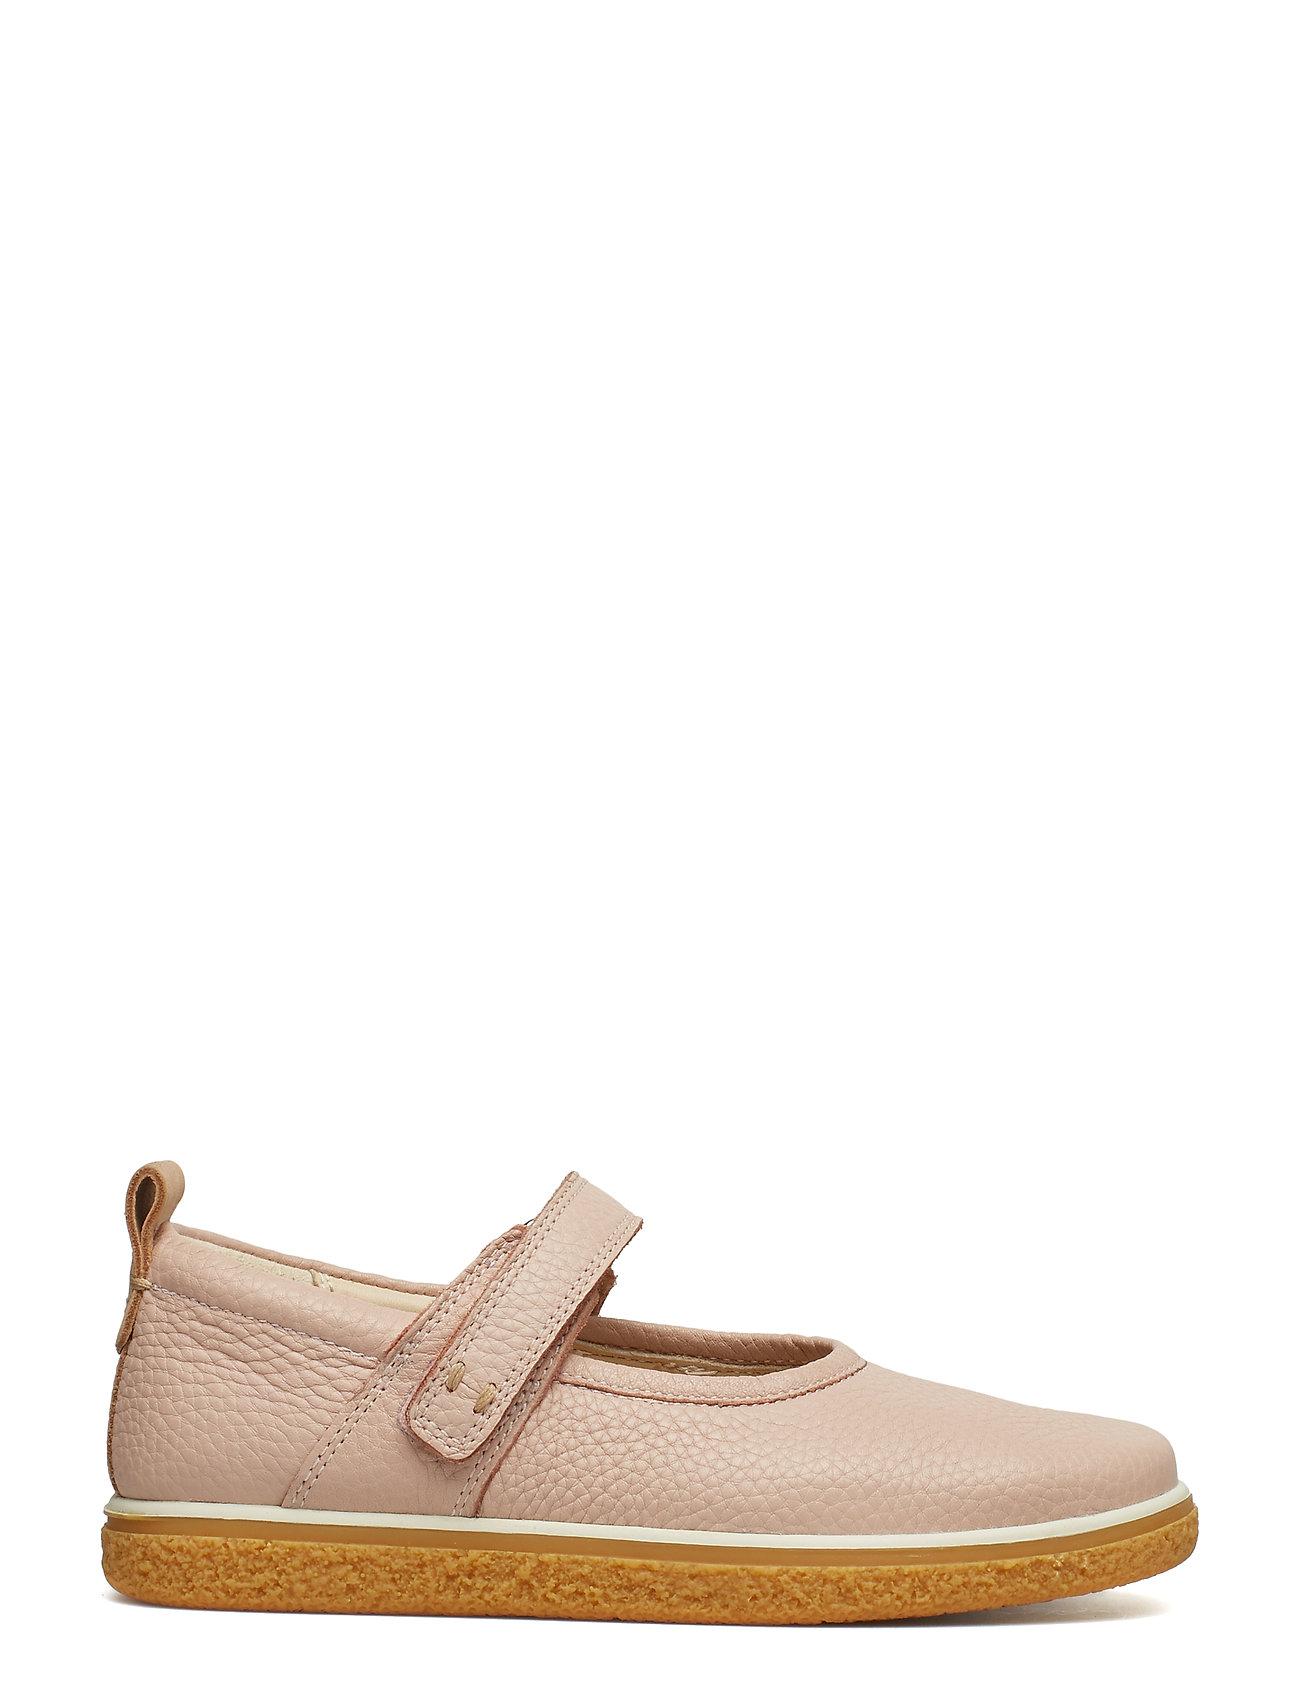 0647bde6ce2 ECCO ballerina sko – Crepetray Girls til børn i DARK SHADOW - Pashion.dk